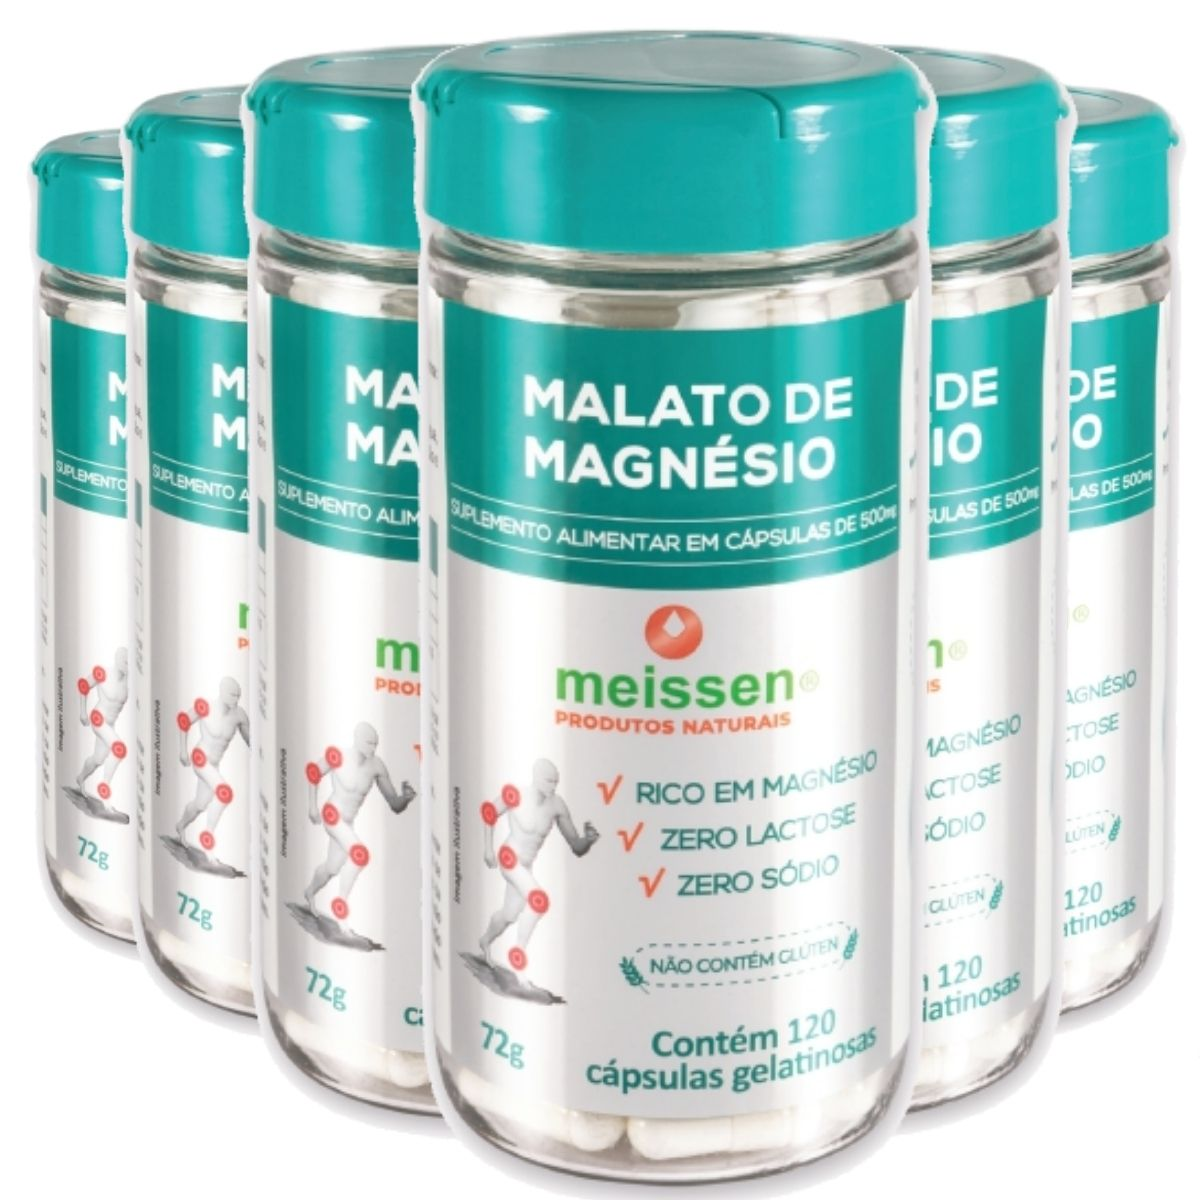 Kit 6 Malato de Magnésio (Magnésio Dimalato) Puro 120 Cápsulas Gelatina - Meissen